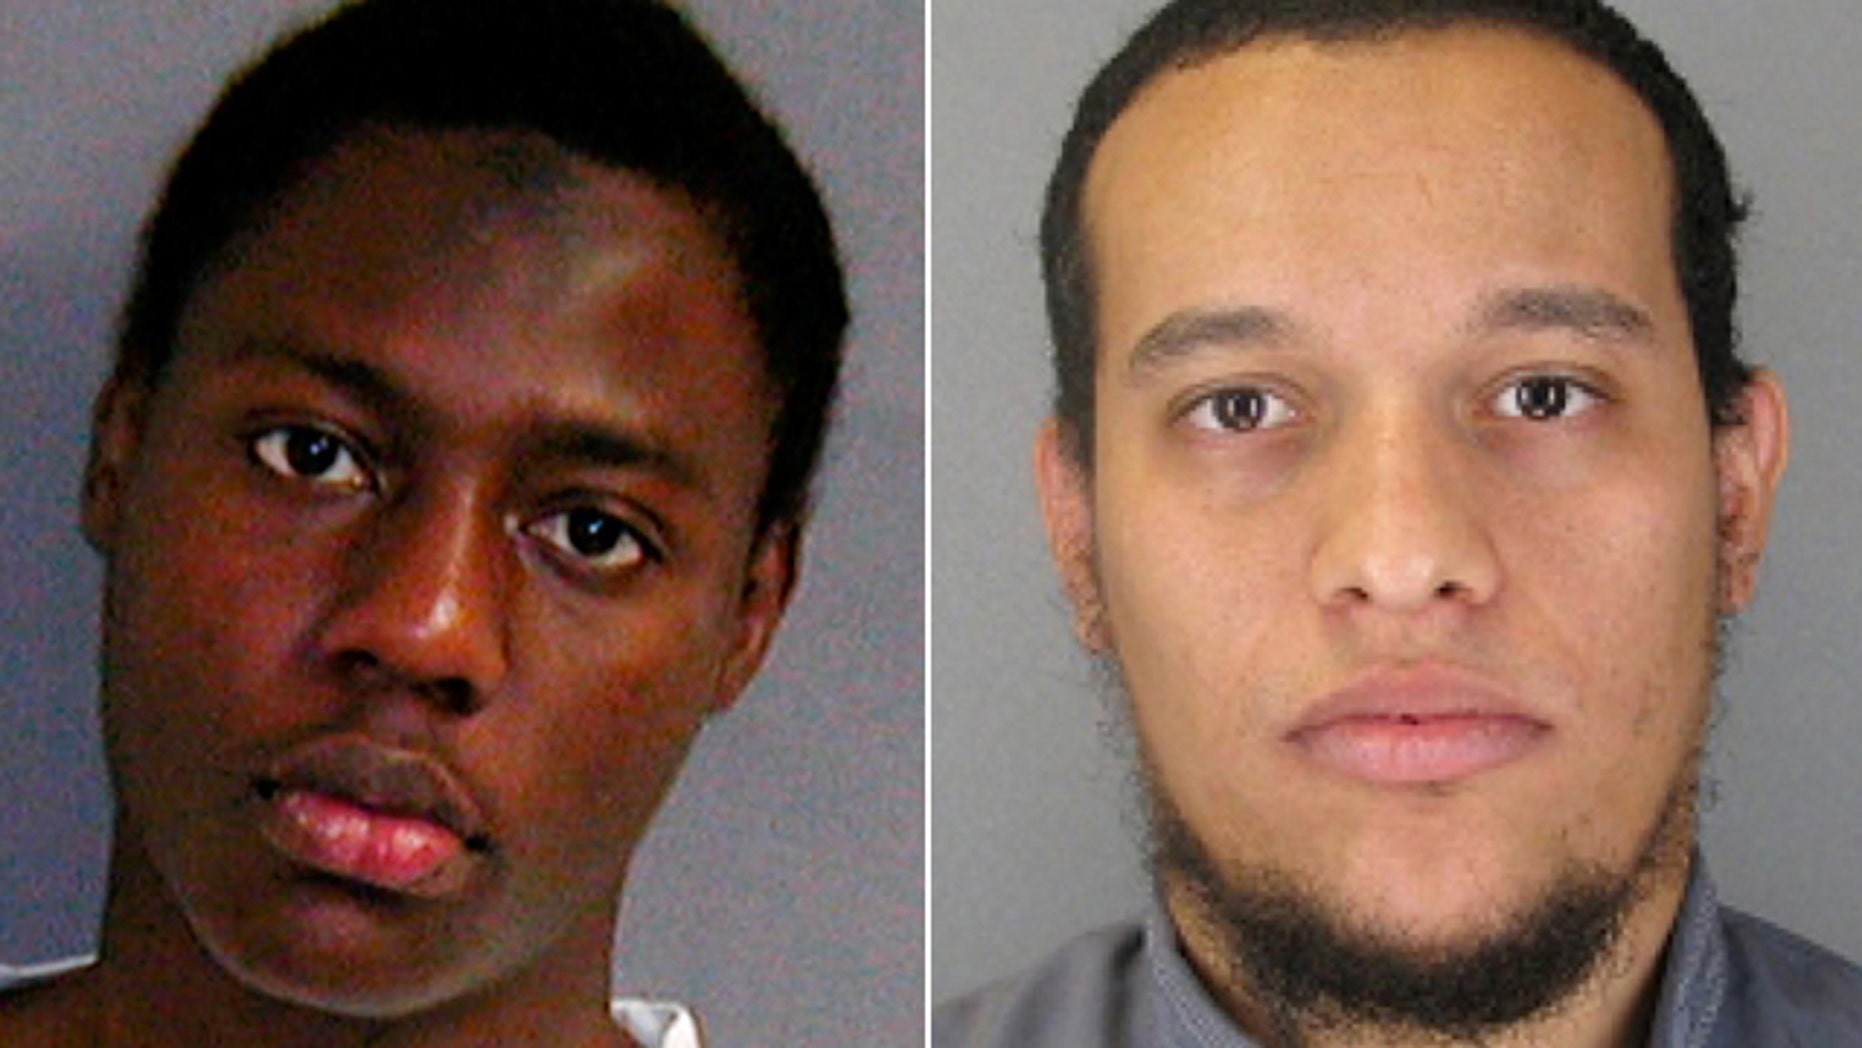 These photos show, at left, the so-called 'underwear bomber' Umar Farouk Abdulmutallab, and, at right, Paris massacre suspect Said Kouachi (Reuters/AP)